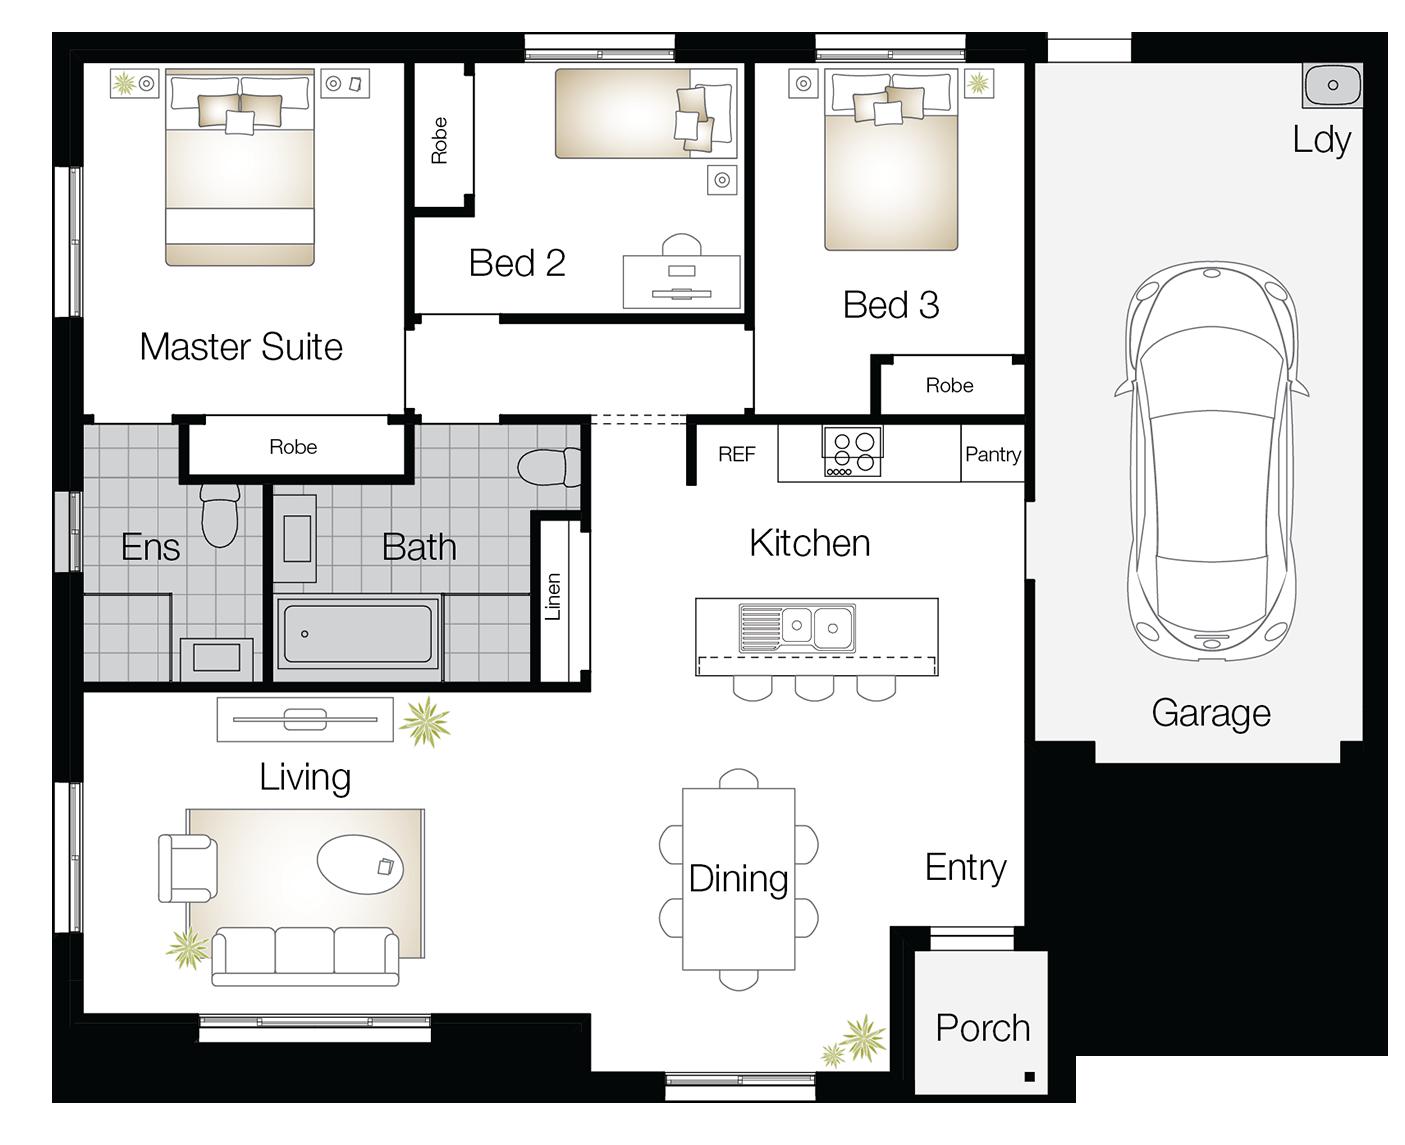 Crestwood - Single Storey Floor Plan - Wilson Homes